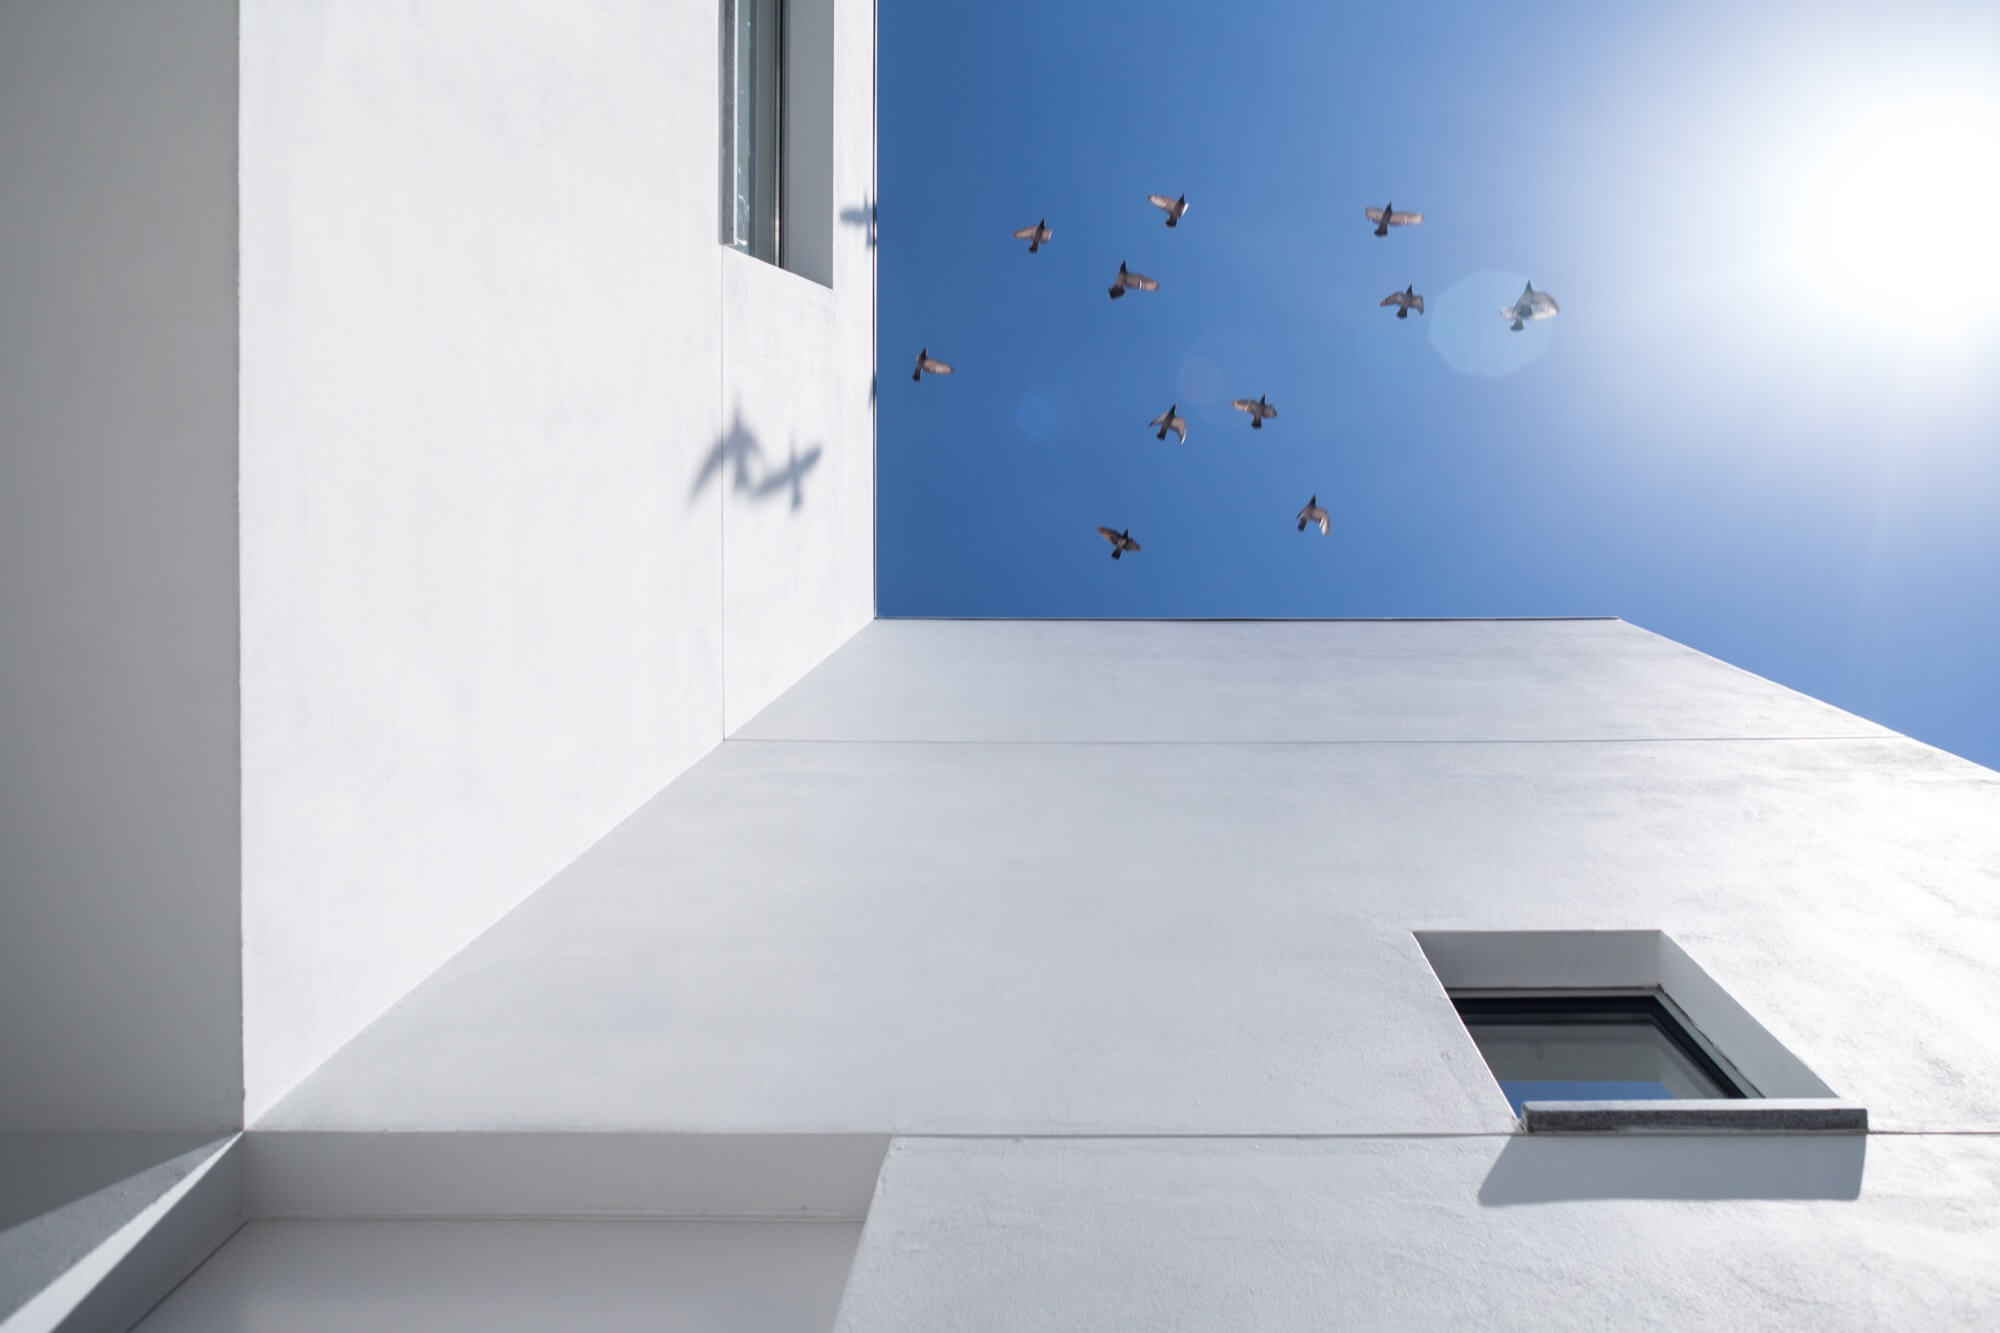 Ivo Tavares Studio – Architectural Photography